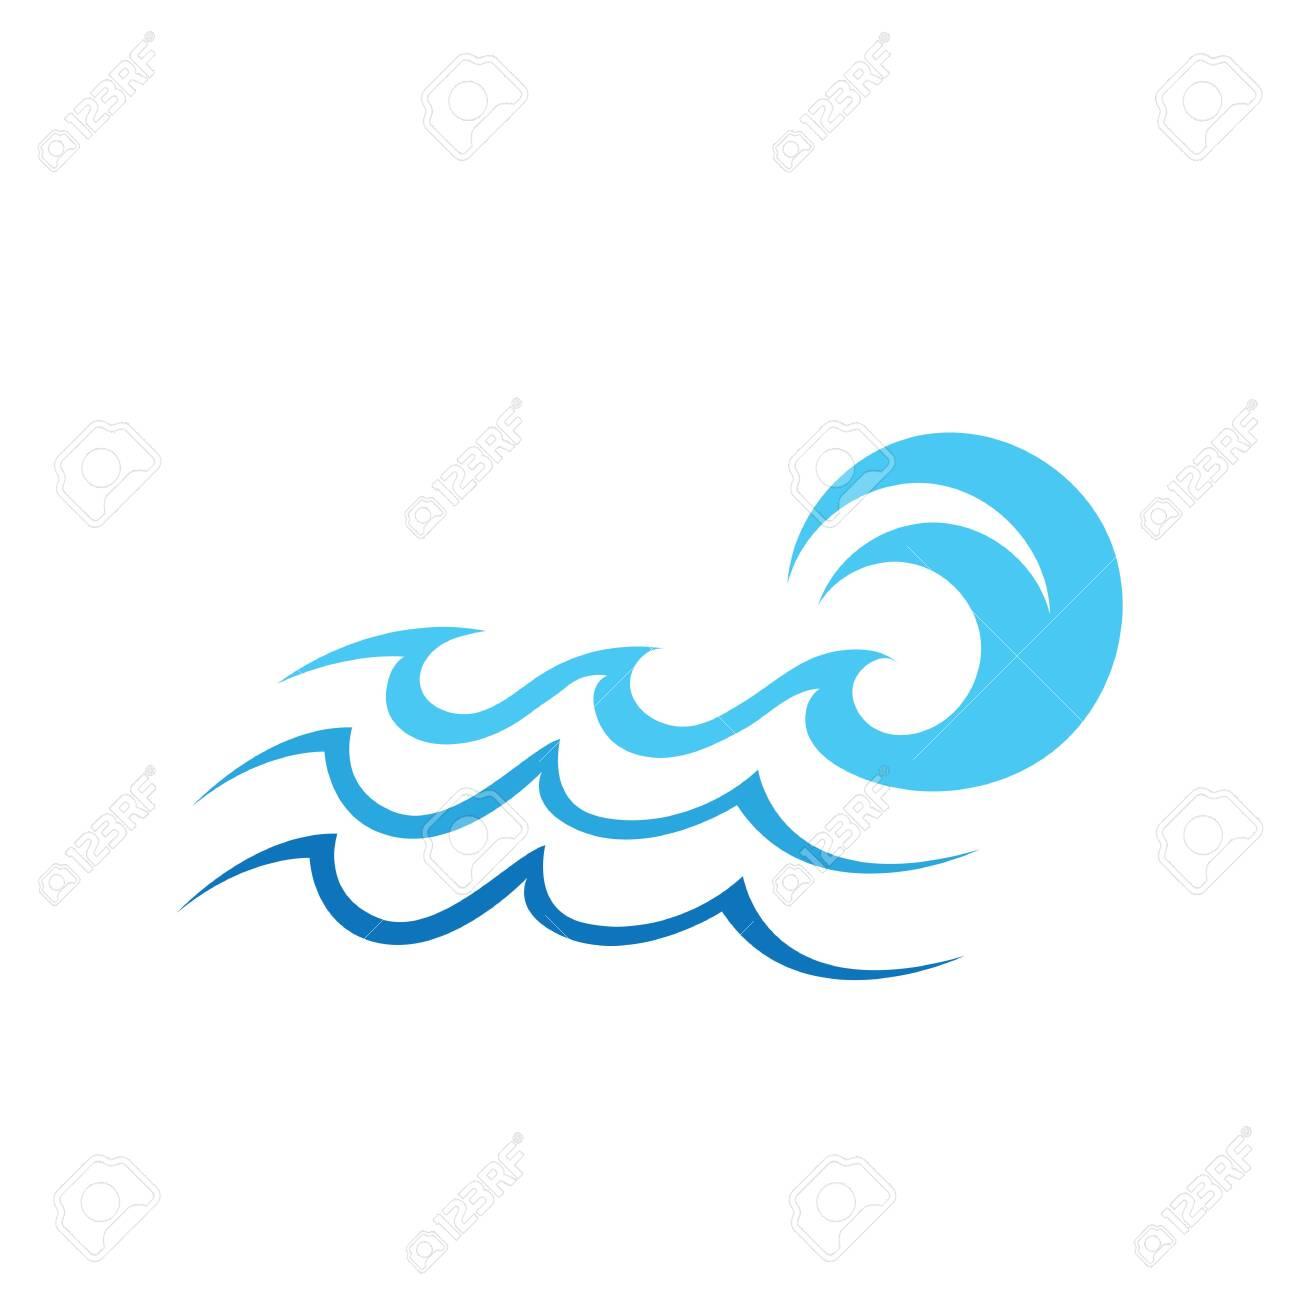 Water wave icon vector illustration design logo - 154403238